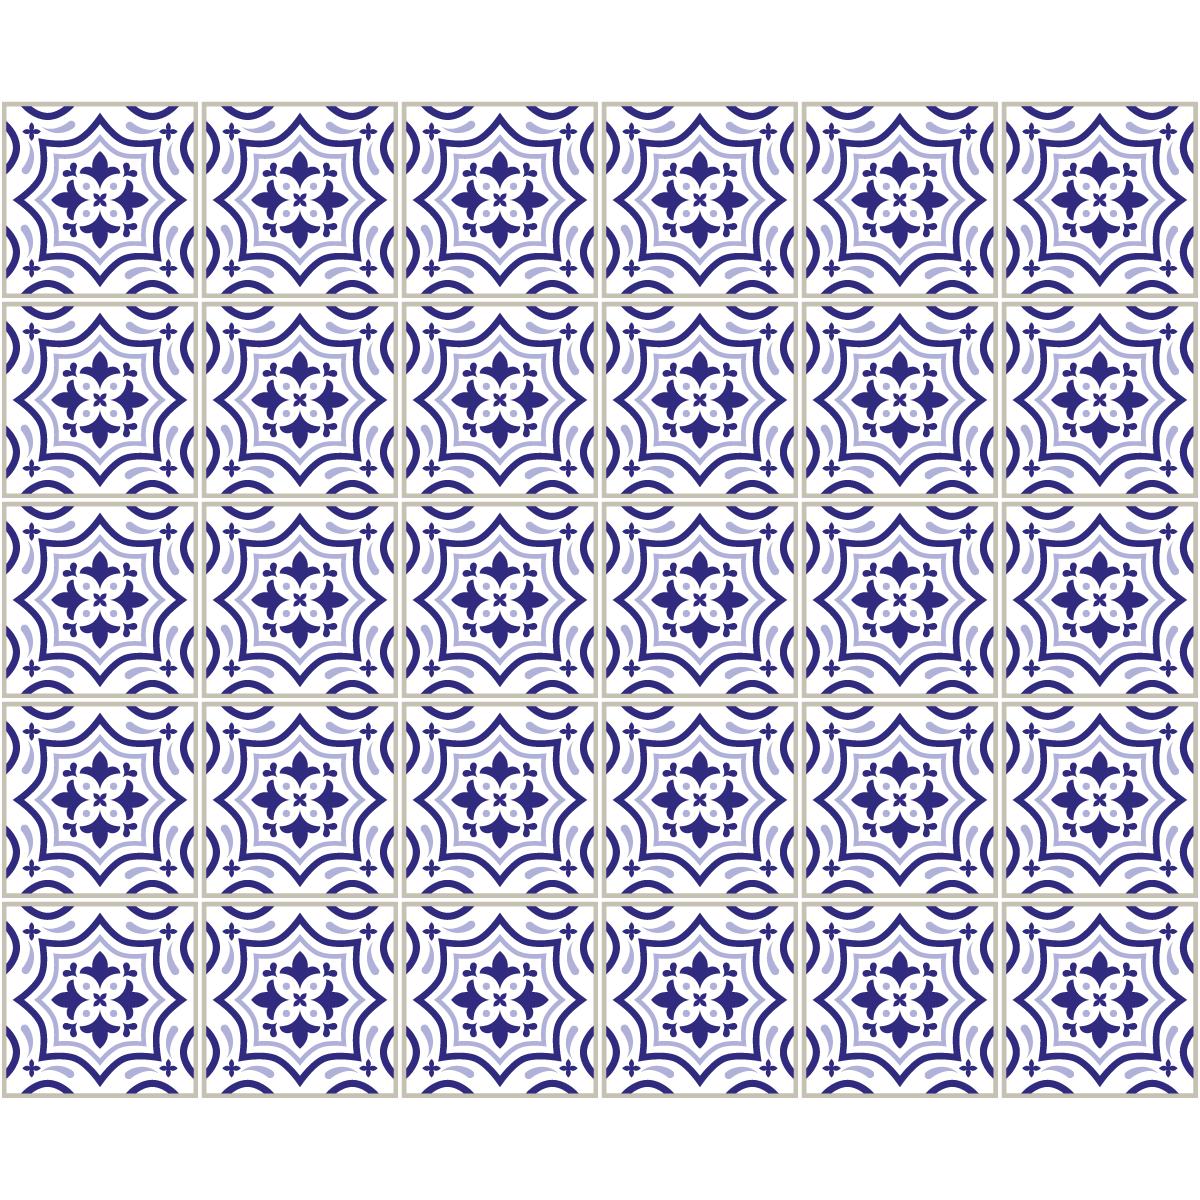 30 stickers carrelages azulejos teofilo salle de bain et. Black Bedroom Furniture Sets. Home Design Ideas